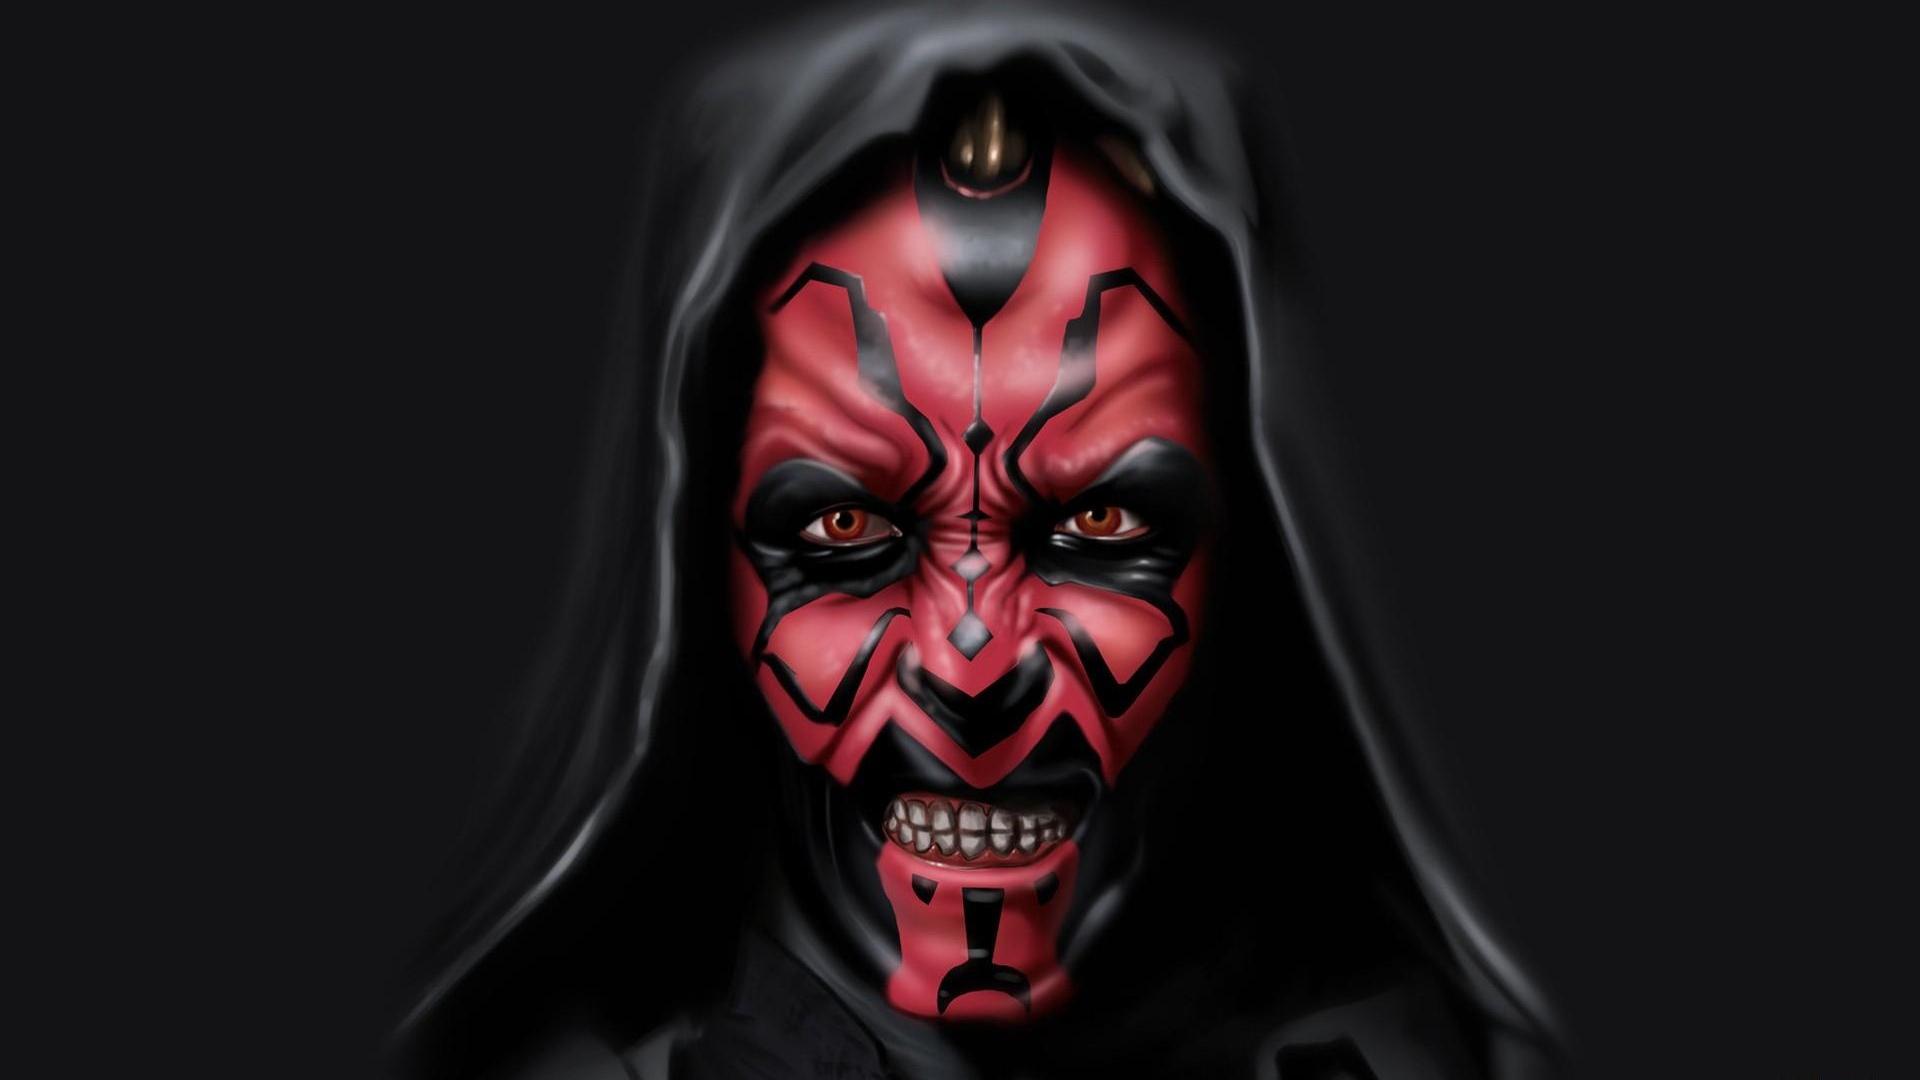 Download Wallpaper 1920x1080 Sith Star Wars Darth Maul Dark Side Full Hd 1080p Hd Background